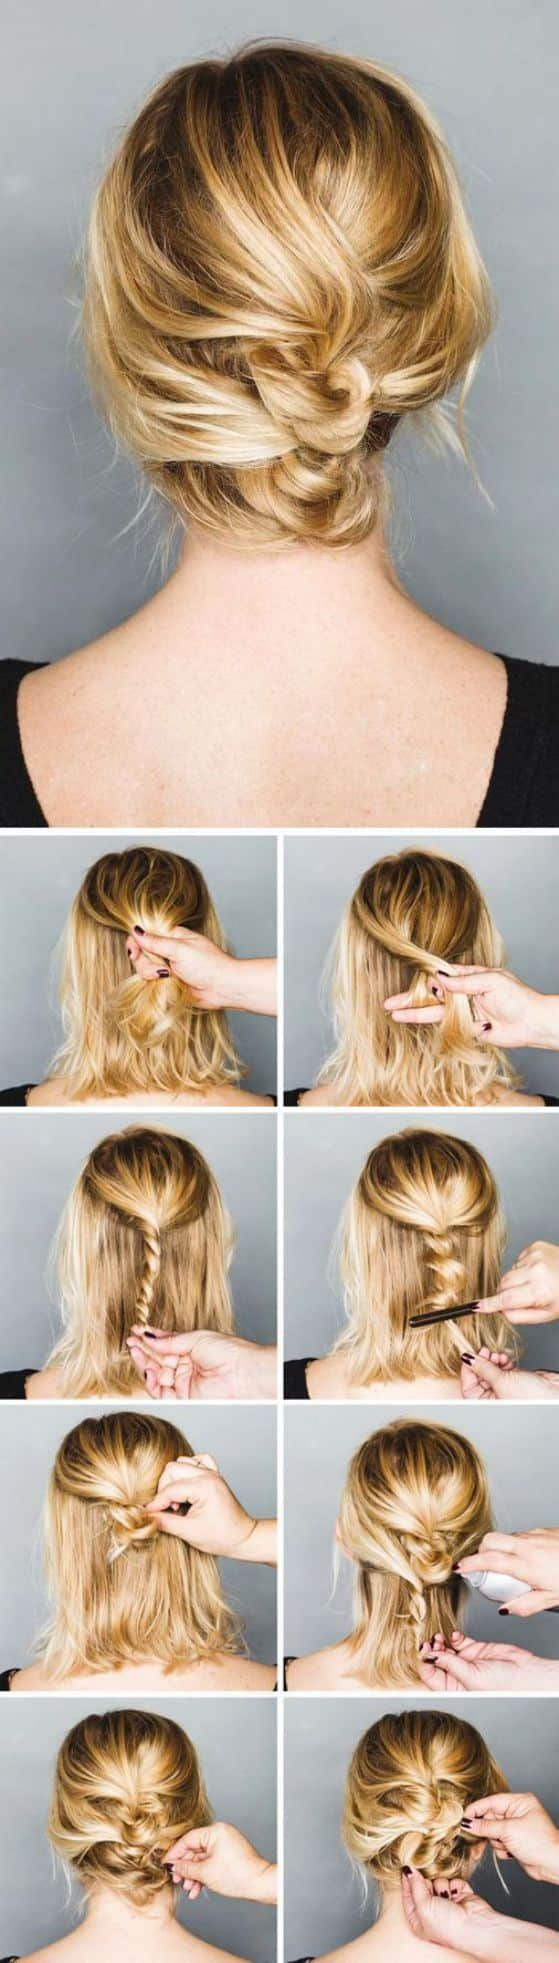 trenza para cabello corto